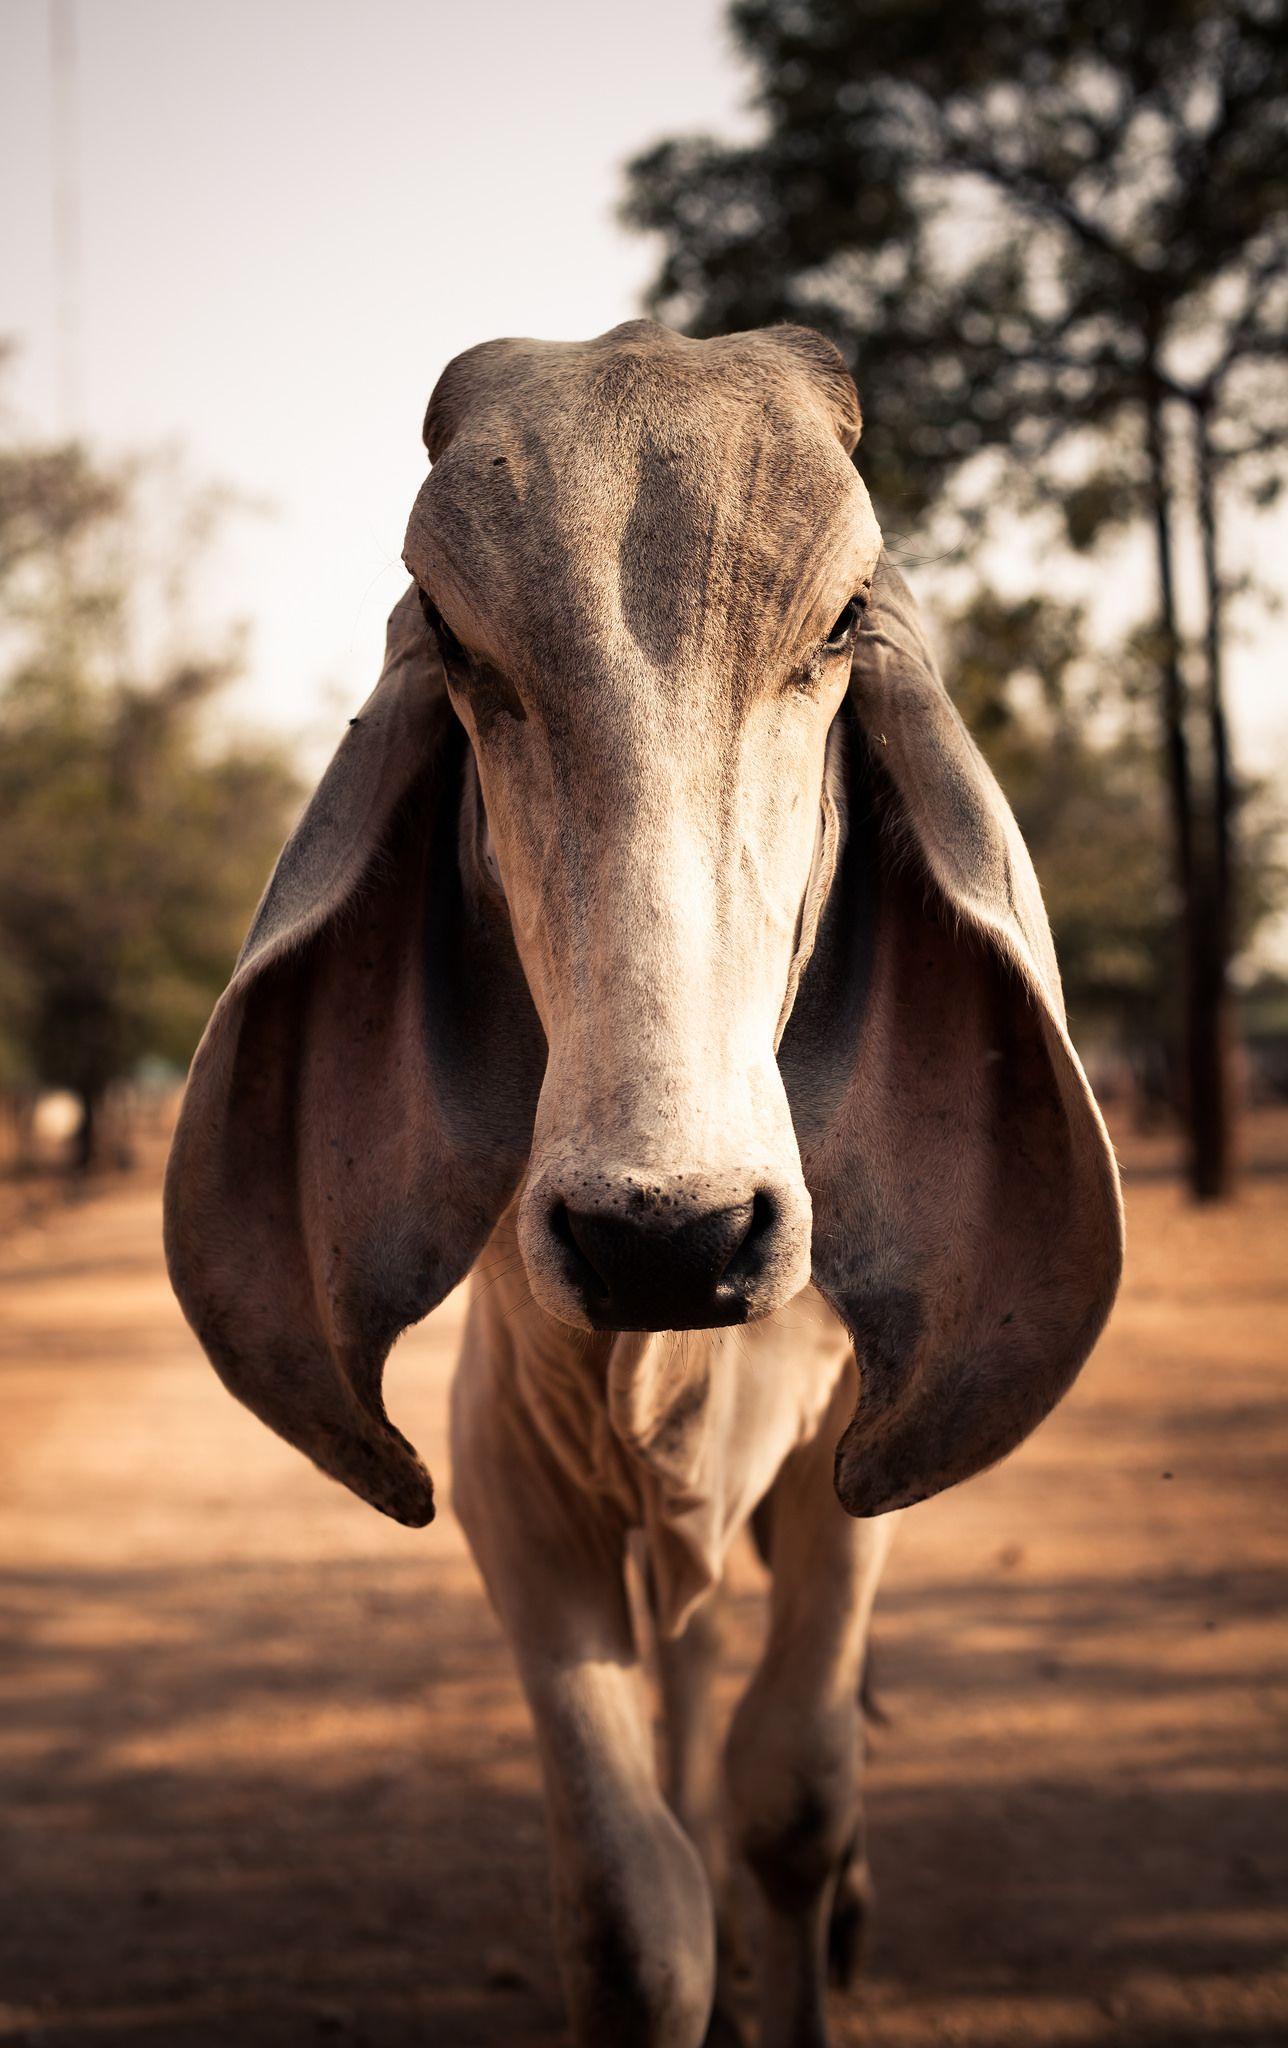 Big Ears Critter Cattle Animals